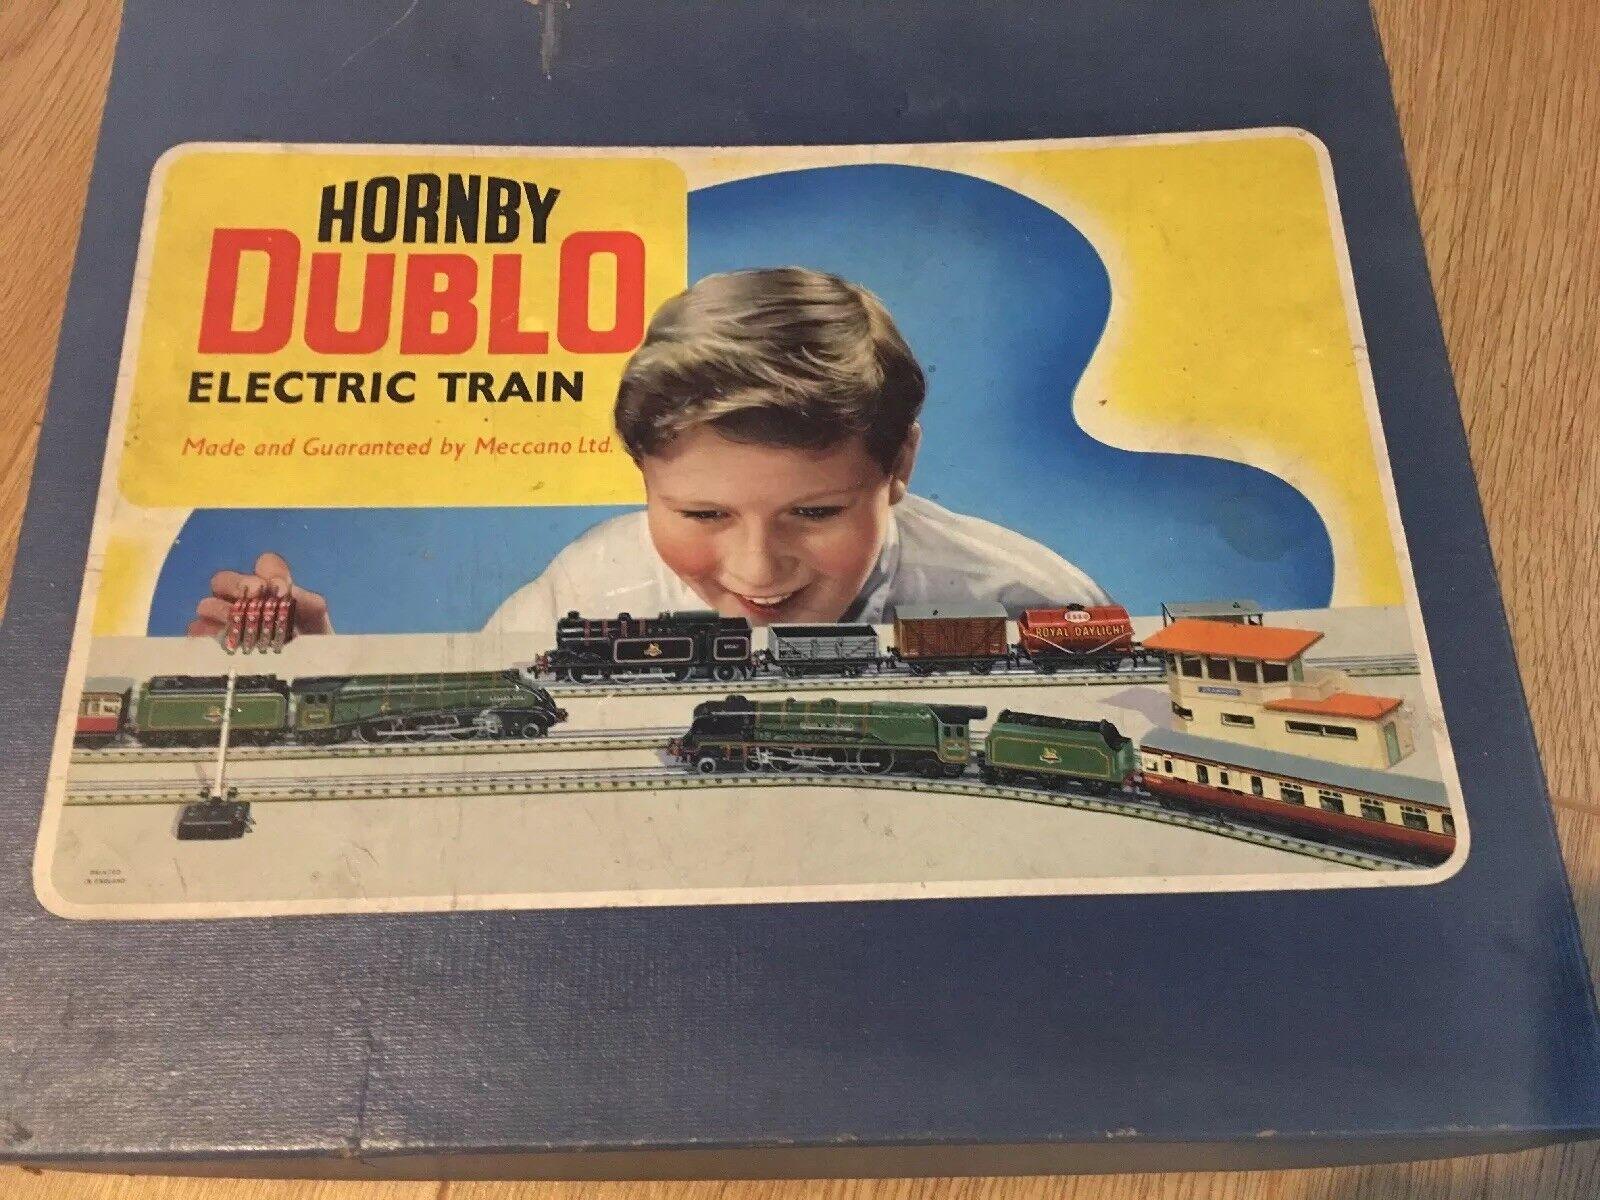 Hornby Dublo 0-6-2 EDG 16 Train Goods Train .